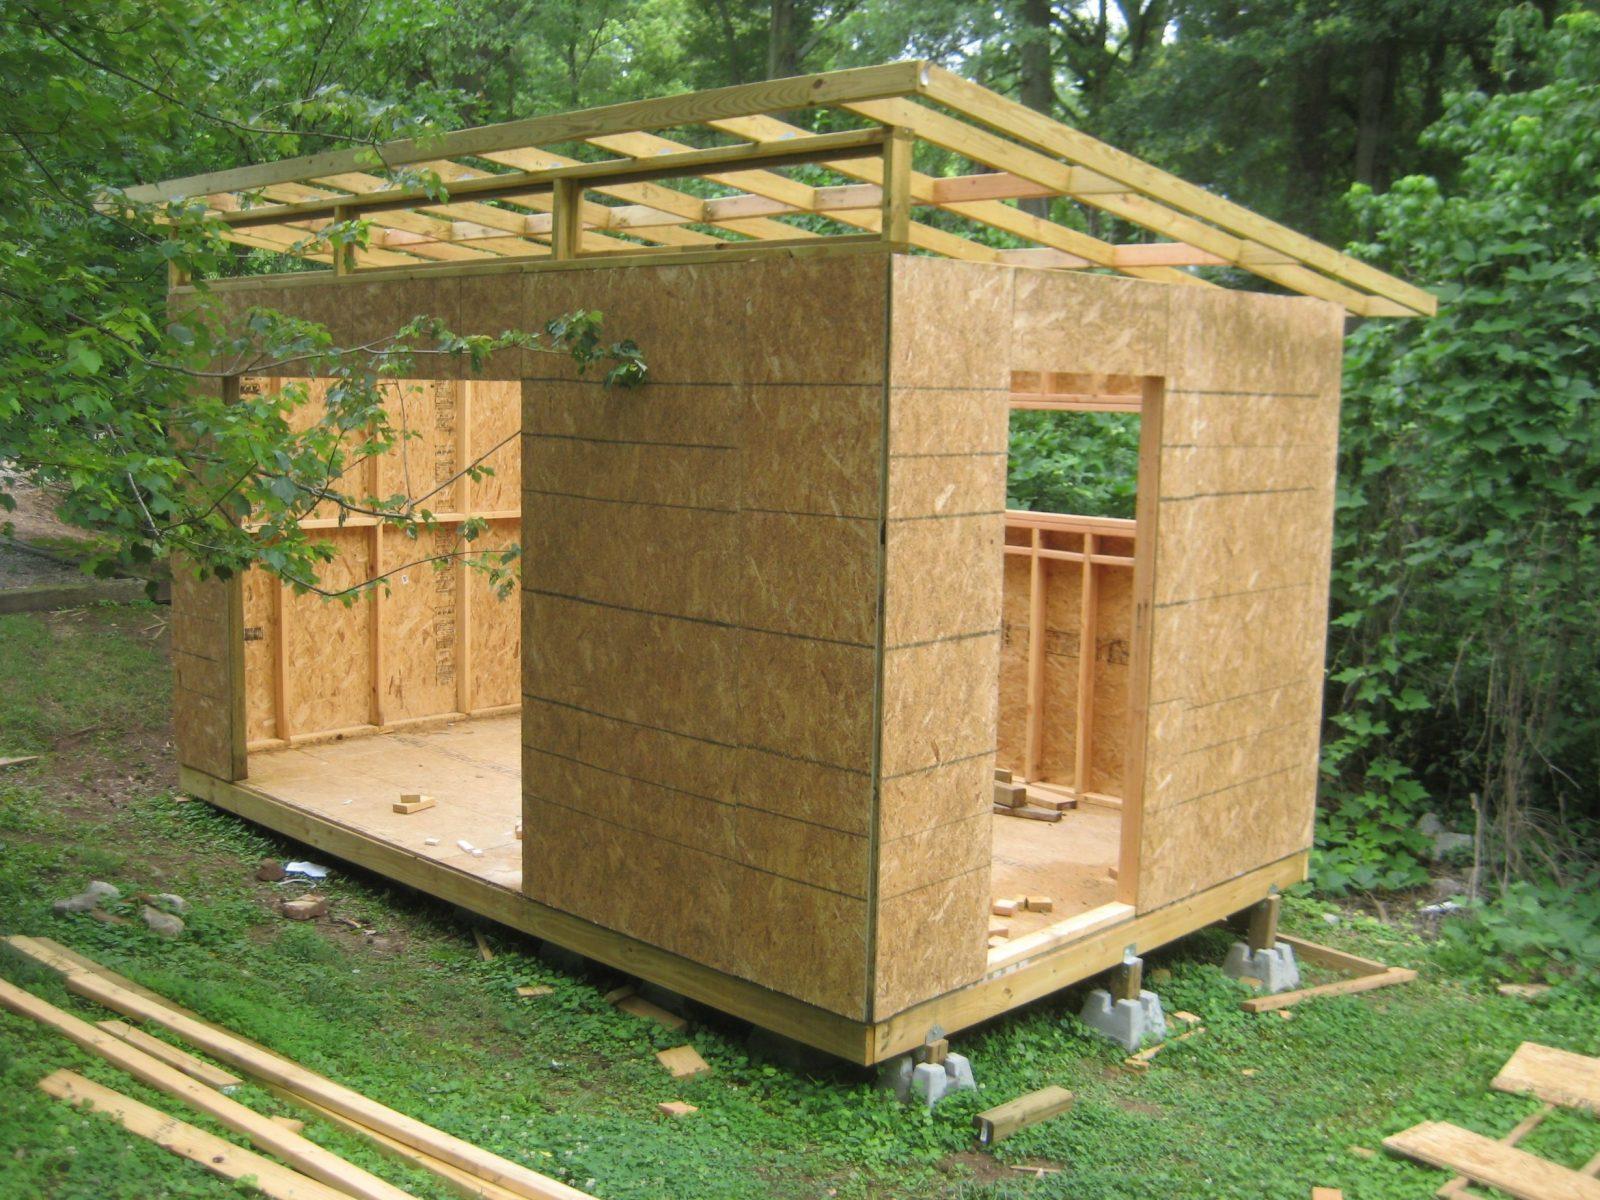 Diy Modern Shed Project  Holz  Gartenhaus Schuppen Ideen Y von Gartenhaus Modern Selber Bauen Bild